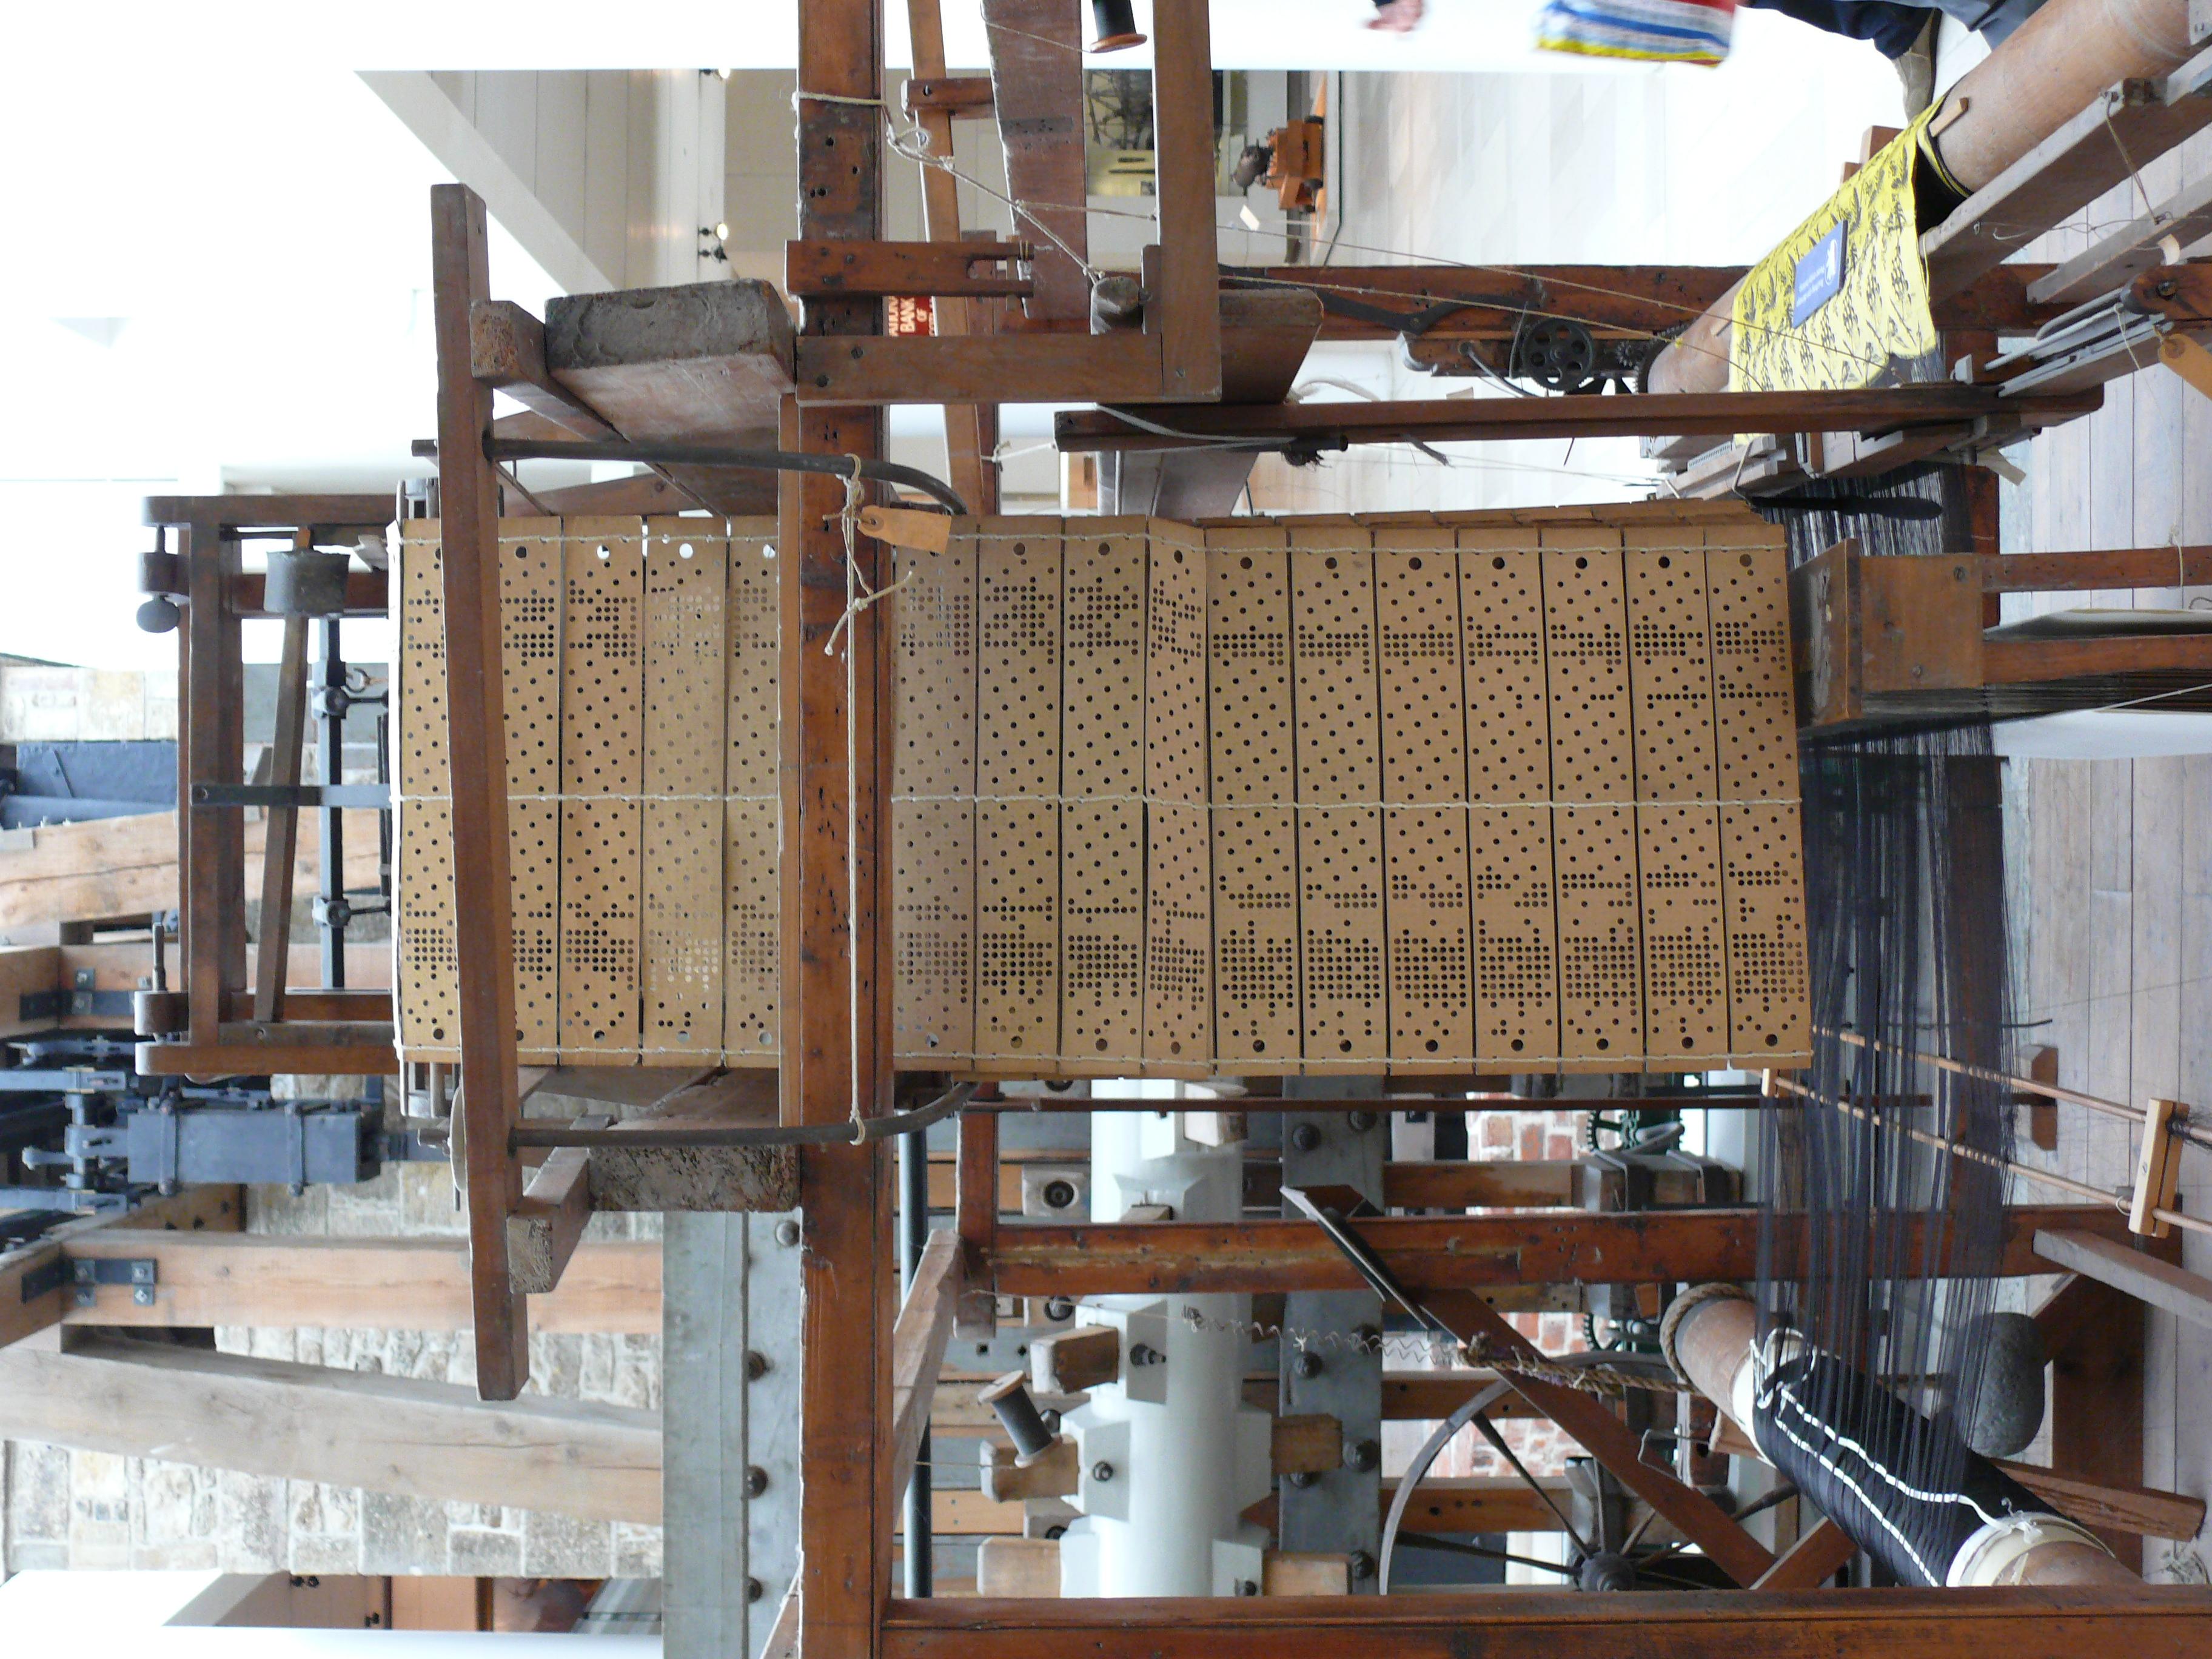 File:NMS Jacquard loom 2.JPG - Wikimedia Commons